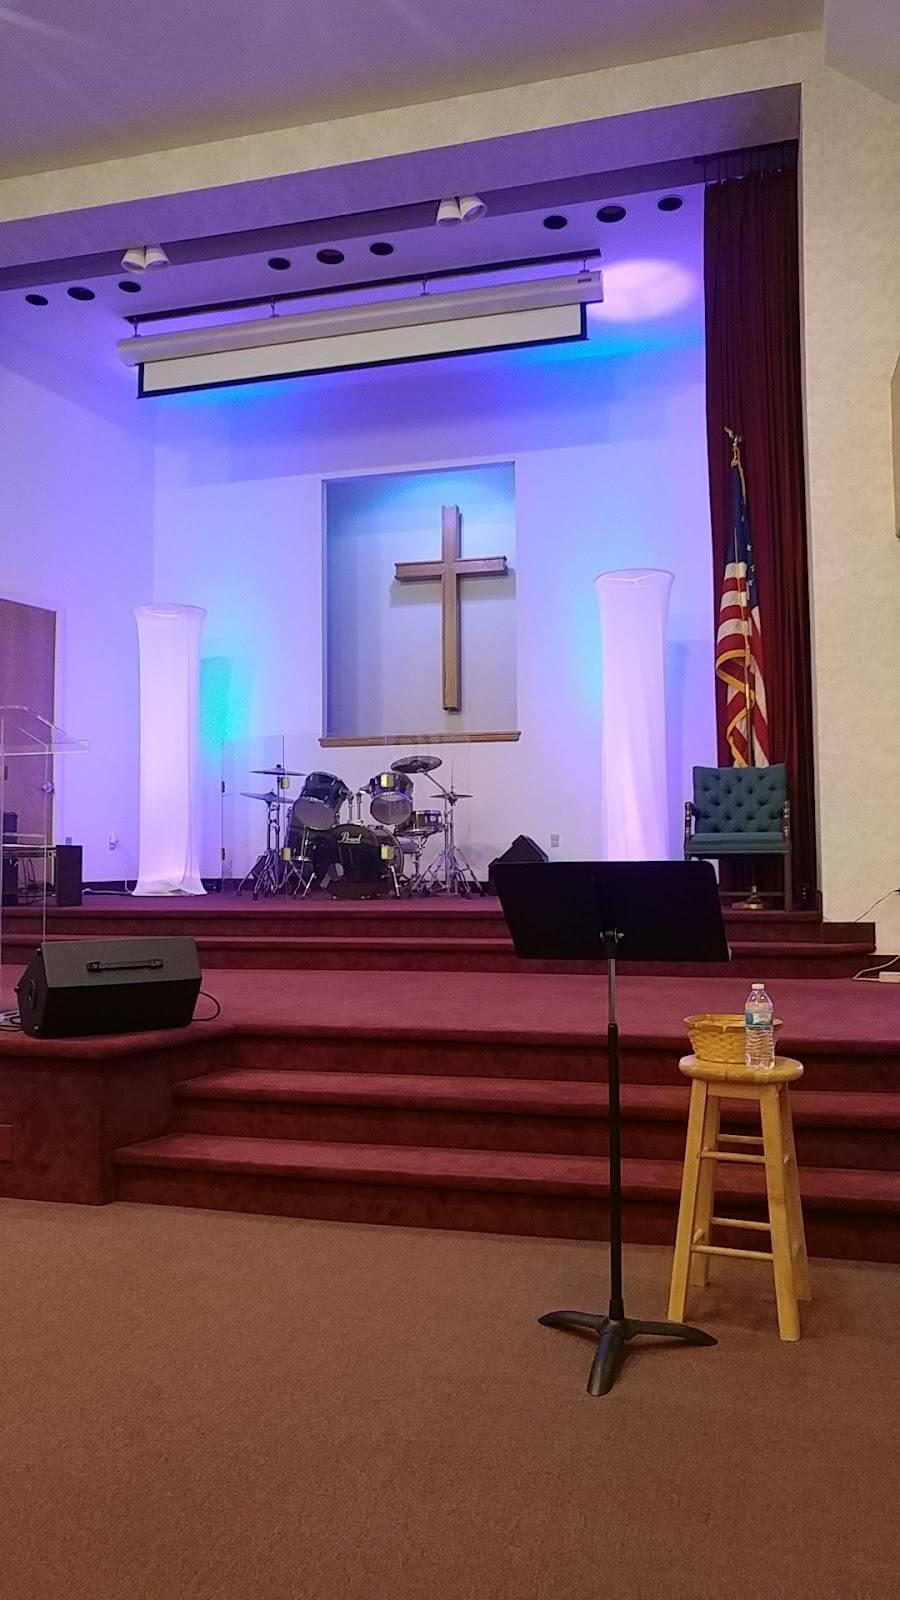 Walnut Grove Assembly of God - church  | Photo 2 of 3 | Address: 44 Adams Ave #2777, West Mifflin, PA 15122, USA | Phone: (412) 469-3010